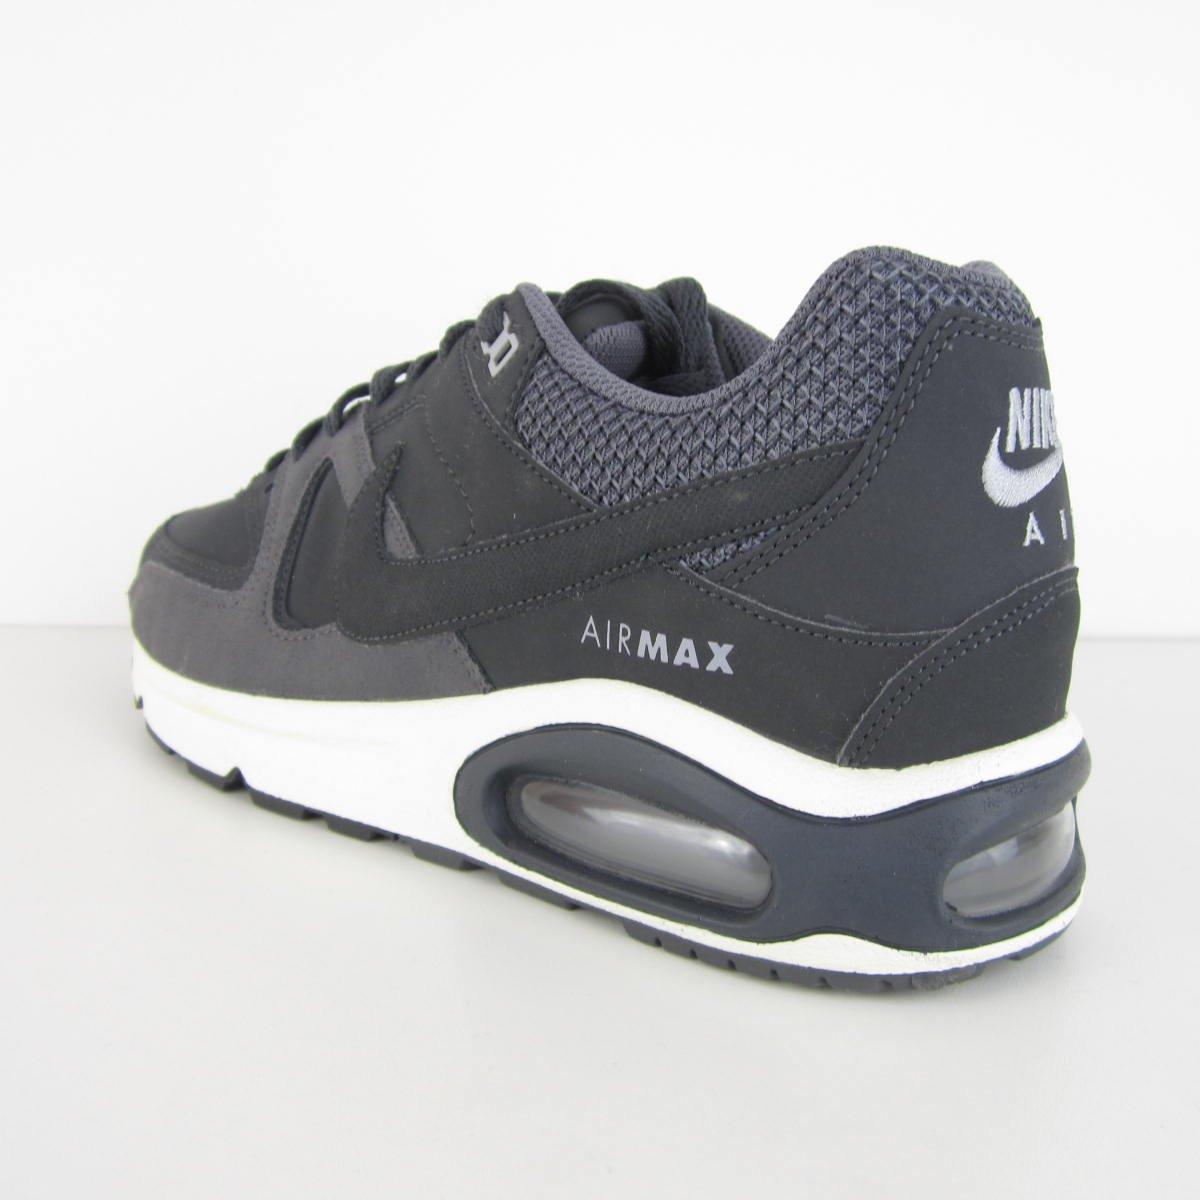 Nike Air Max Command Leather Schuhe Sneaker 098 Neu Grau